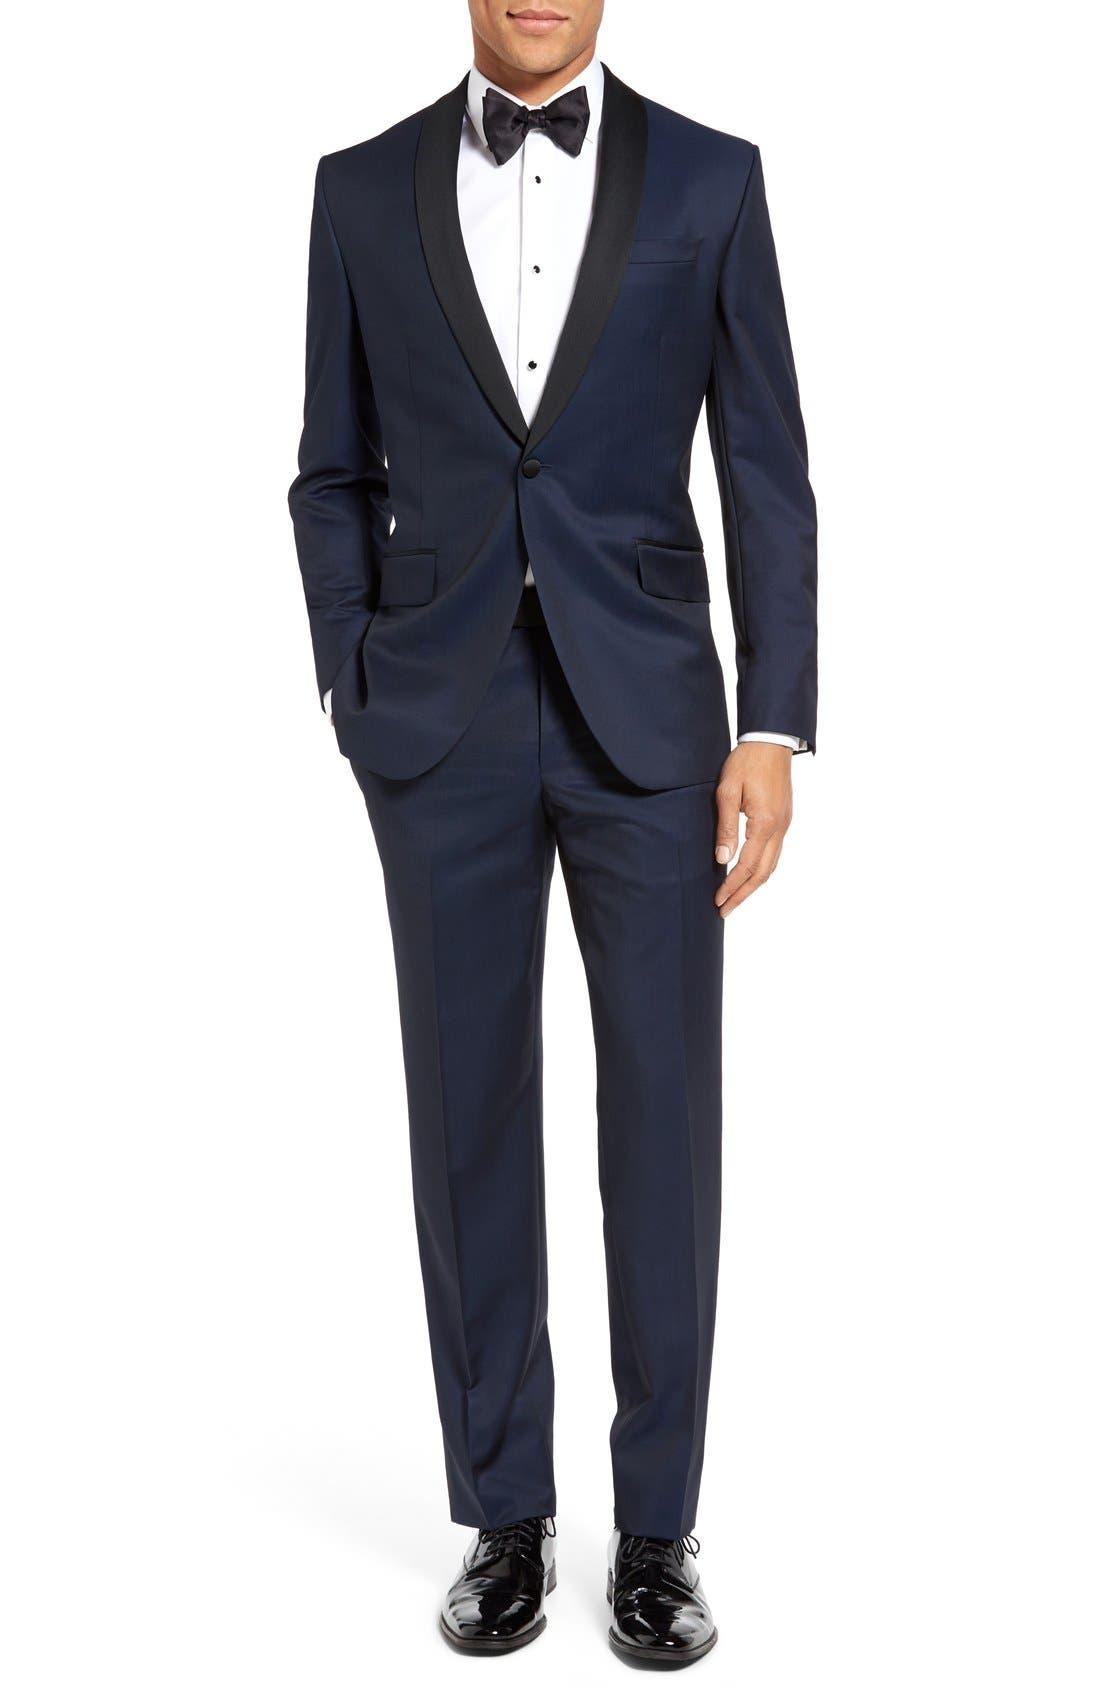 Alternate Image 1 Selected - Ted Baker London 'Josh' Trim Fit Navy Shawl Lapel Tuxedo